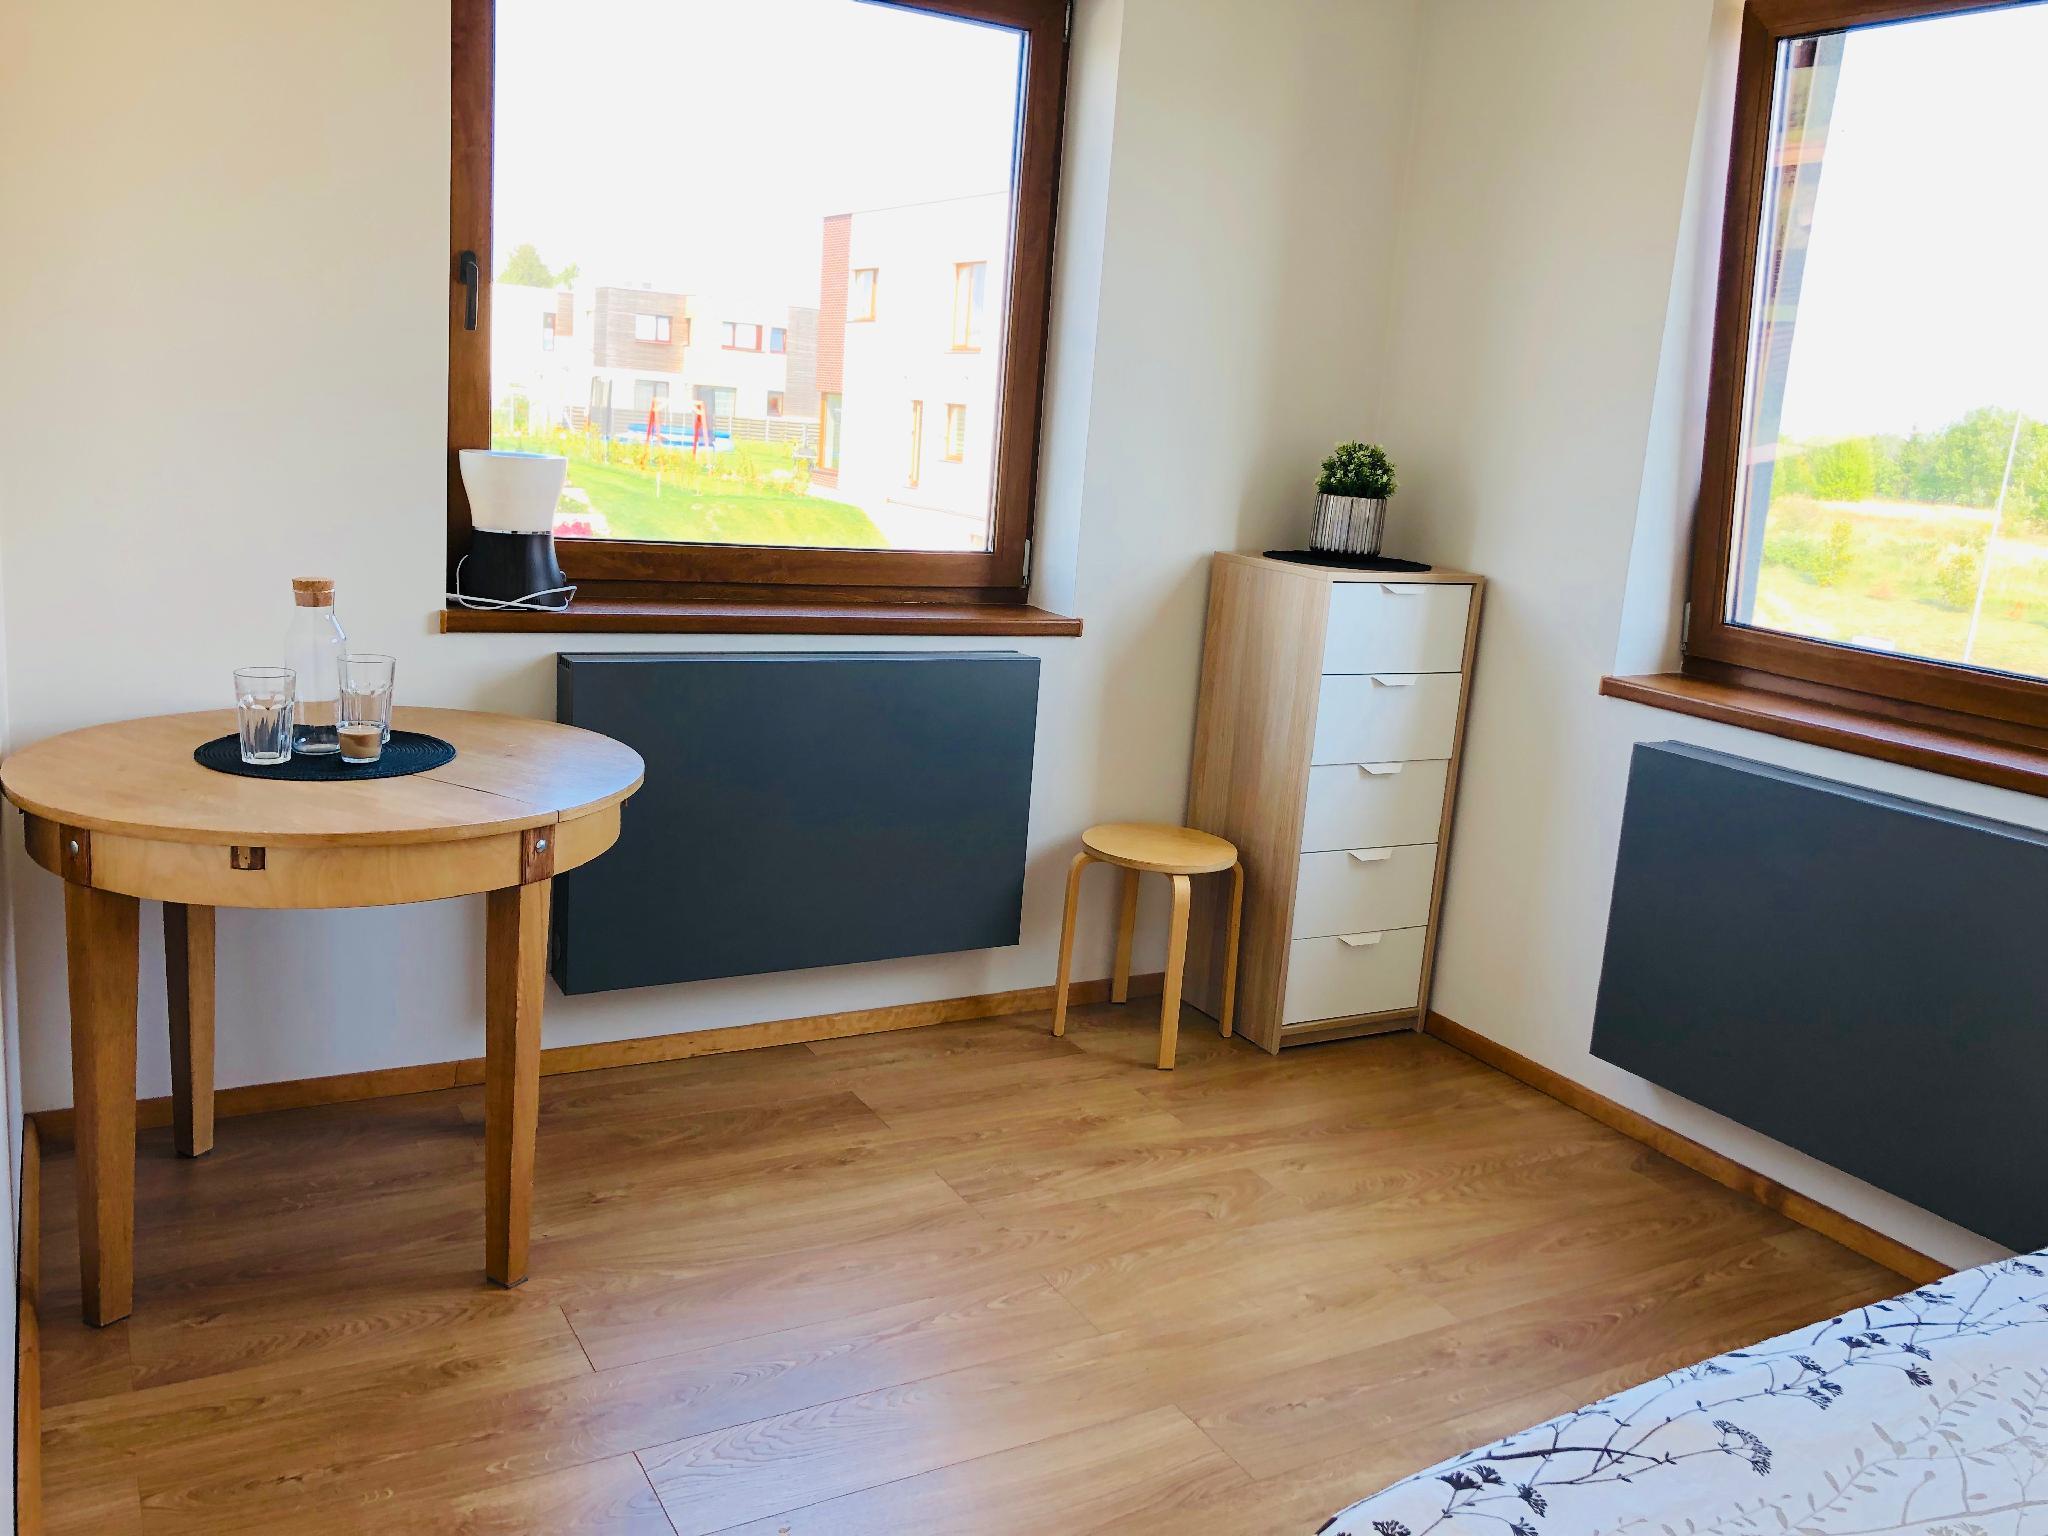 House 3 Bedroom Vilnius